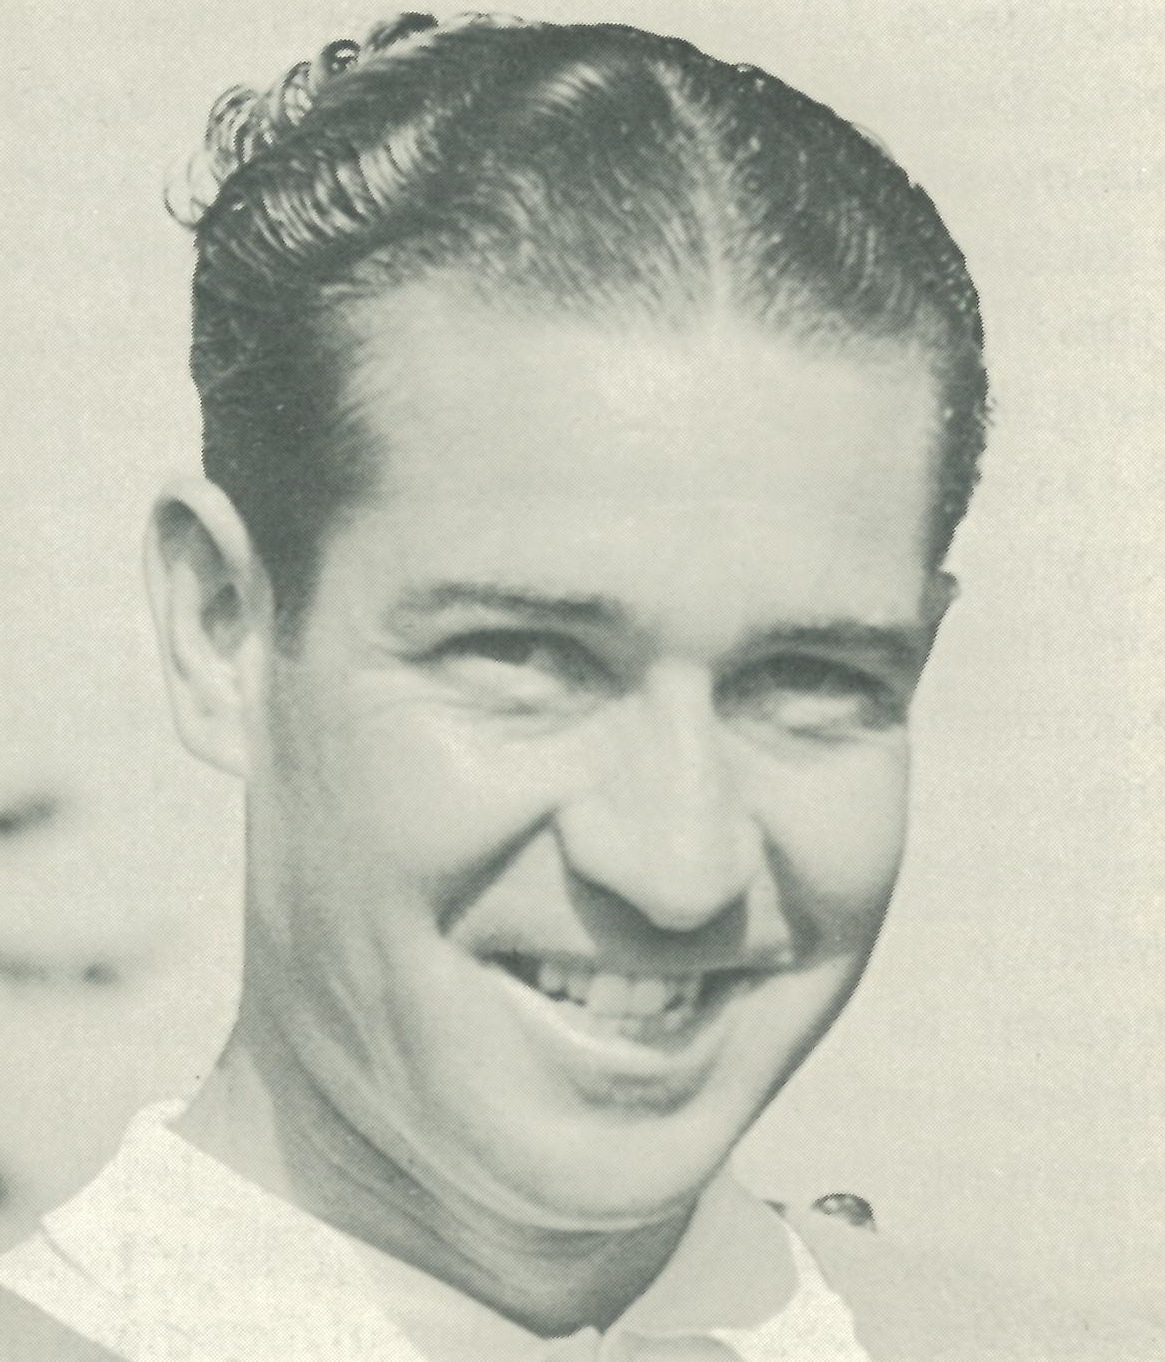 Dick Metz